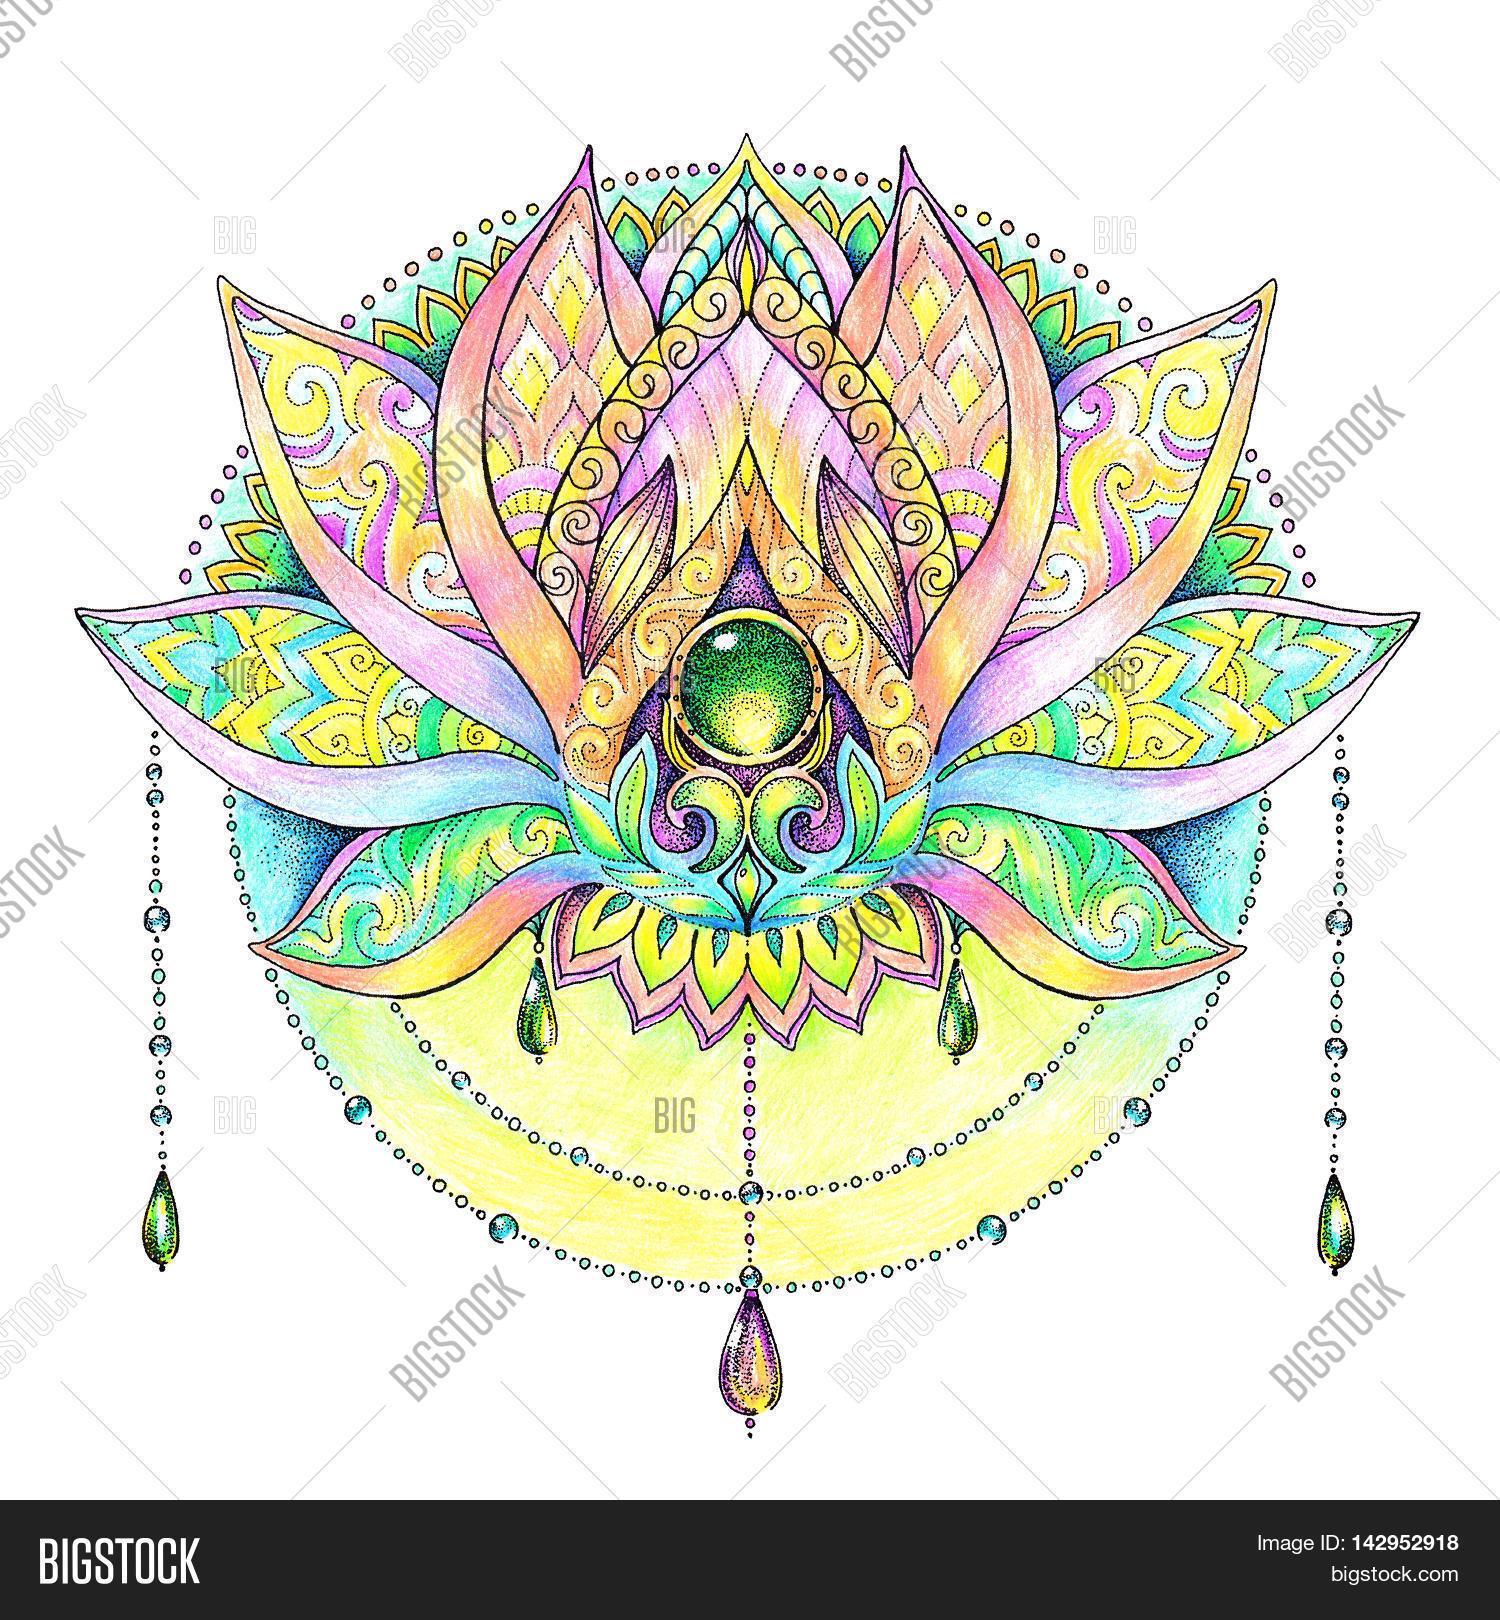 Mandala Pattern Image Photo Free Trial Bigstock